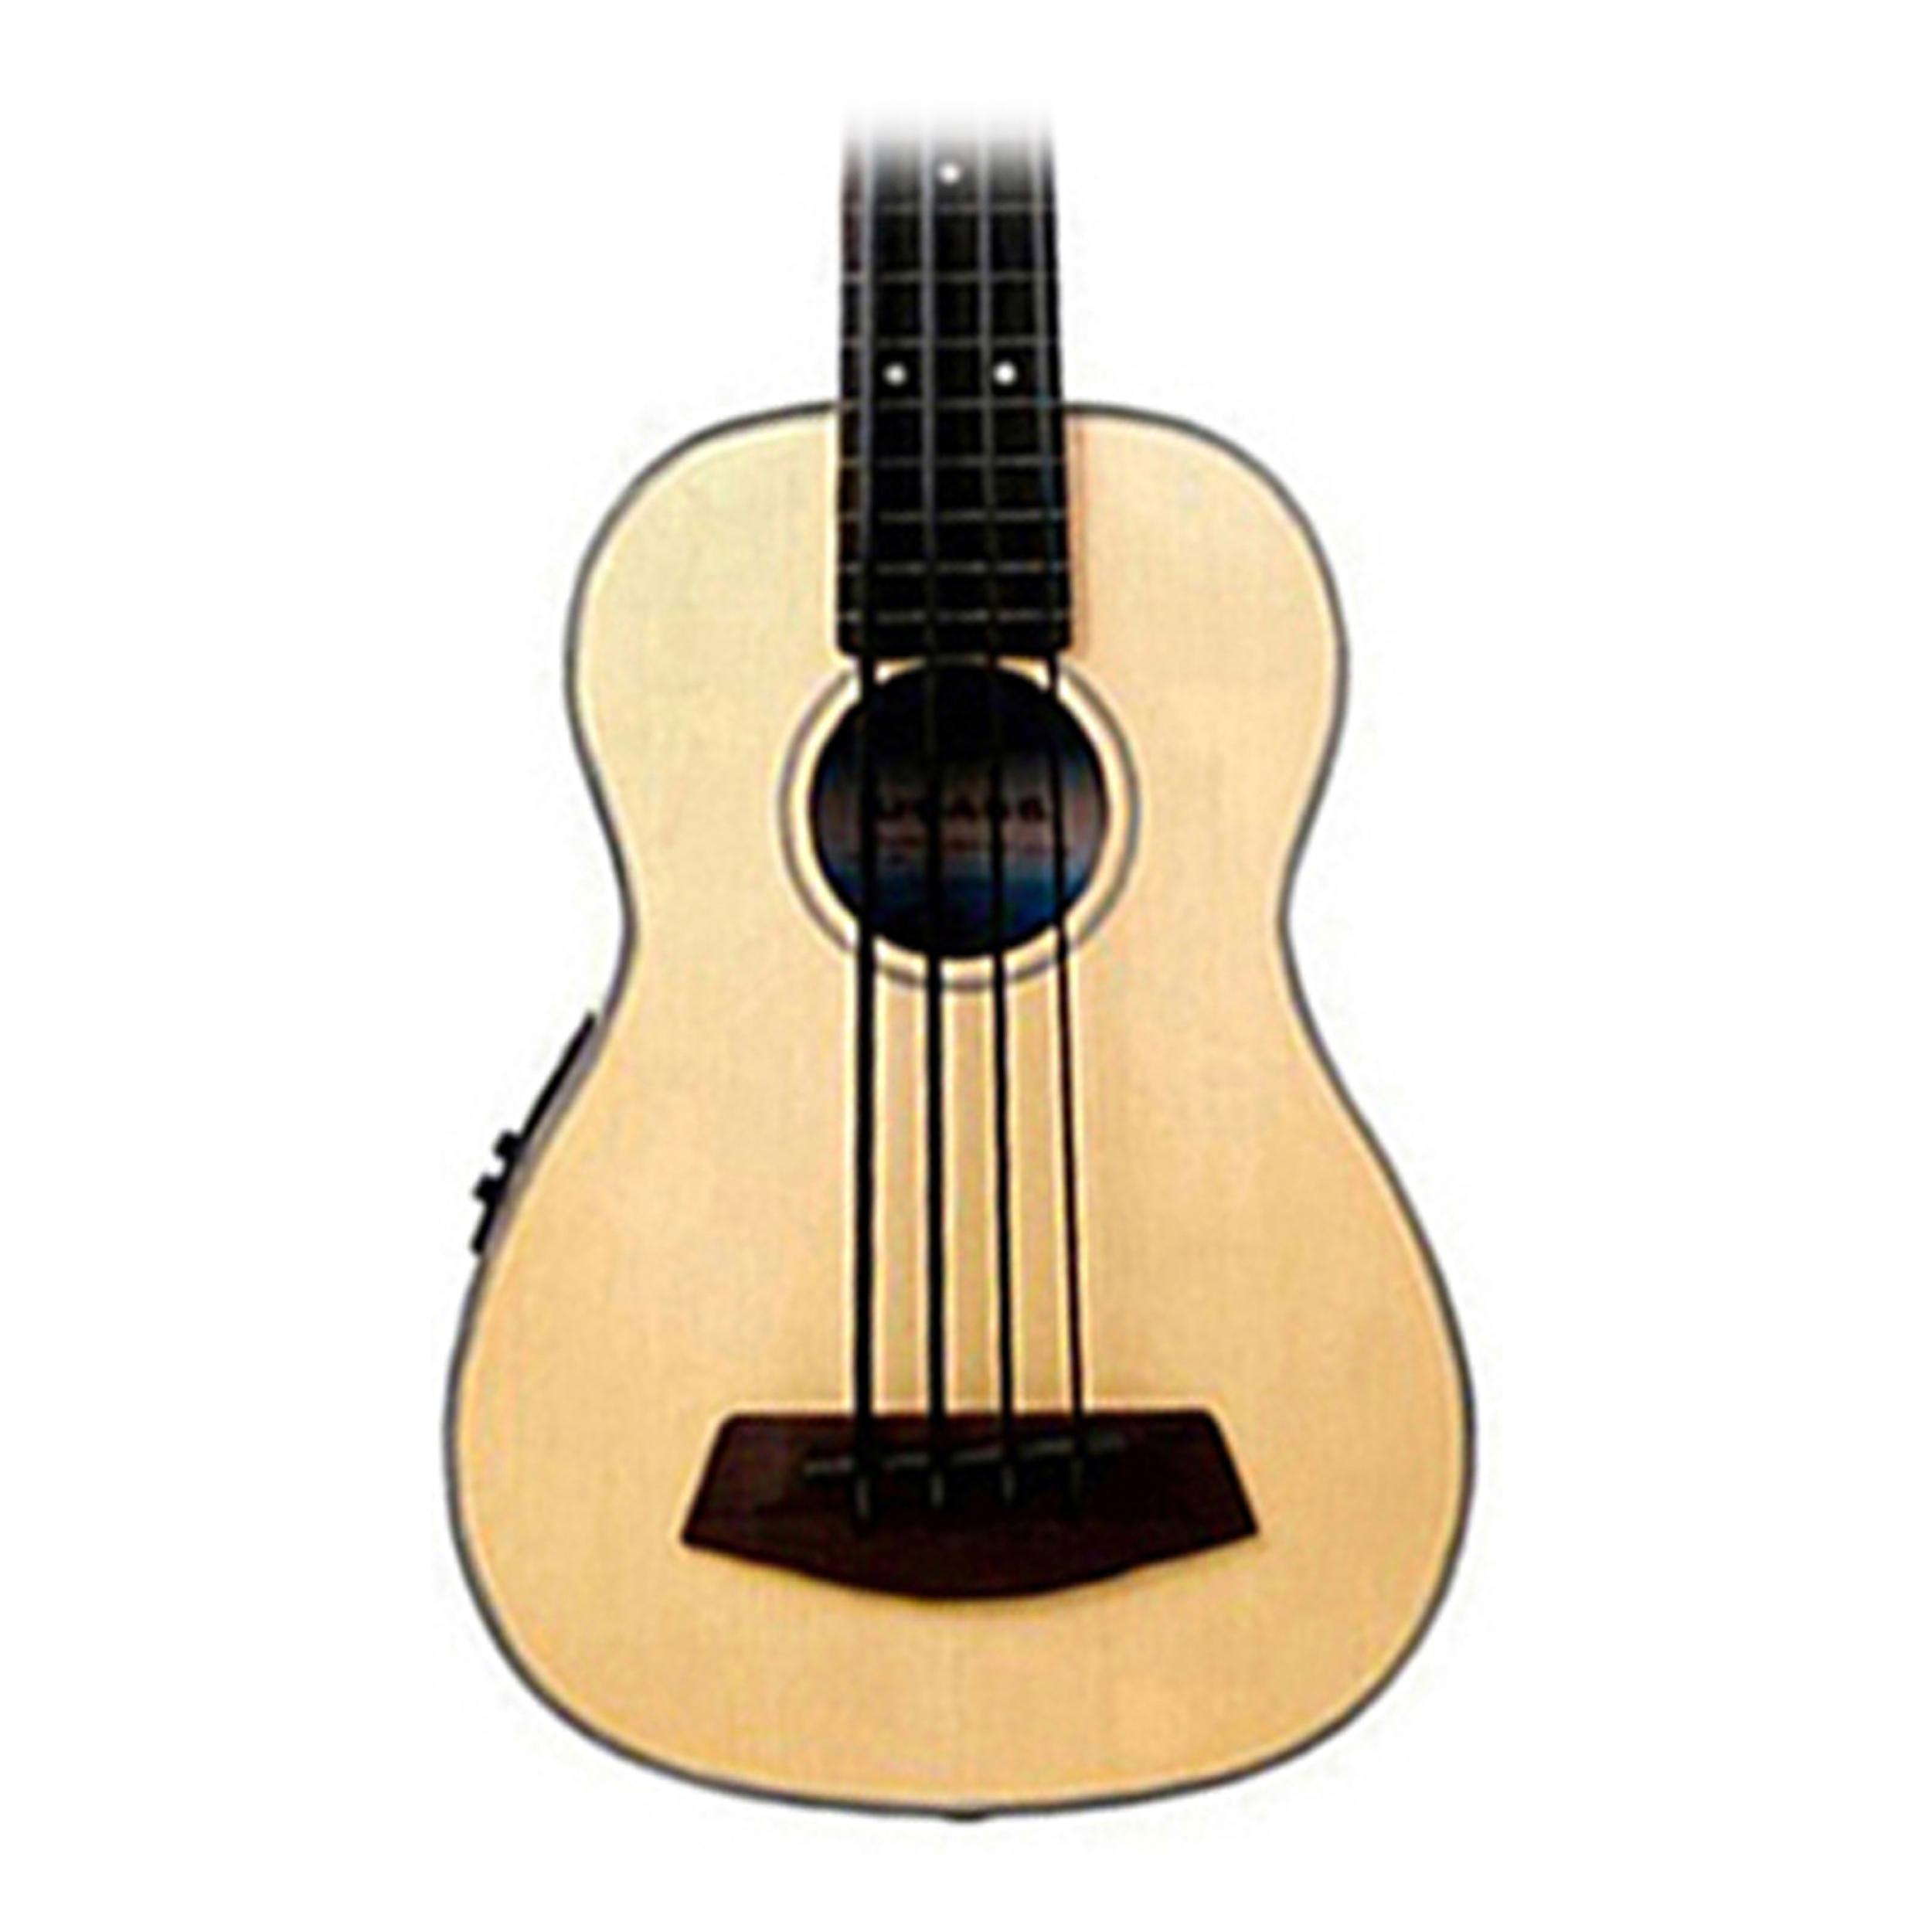 kala 2013 u bass 20 scale fretless bass ukulele with eq and gig bag ebay. Black Bedroom Furniture Sets. Home Design Ideas